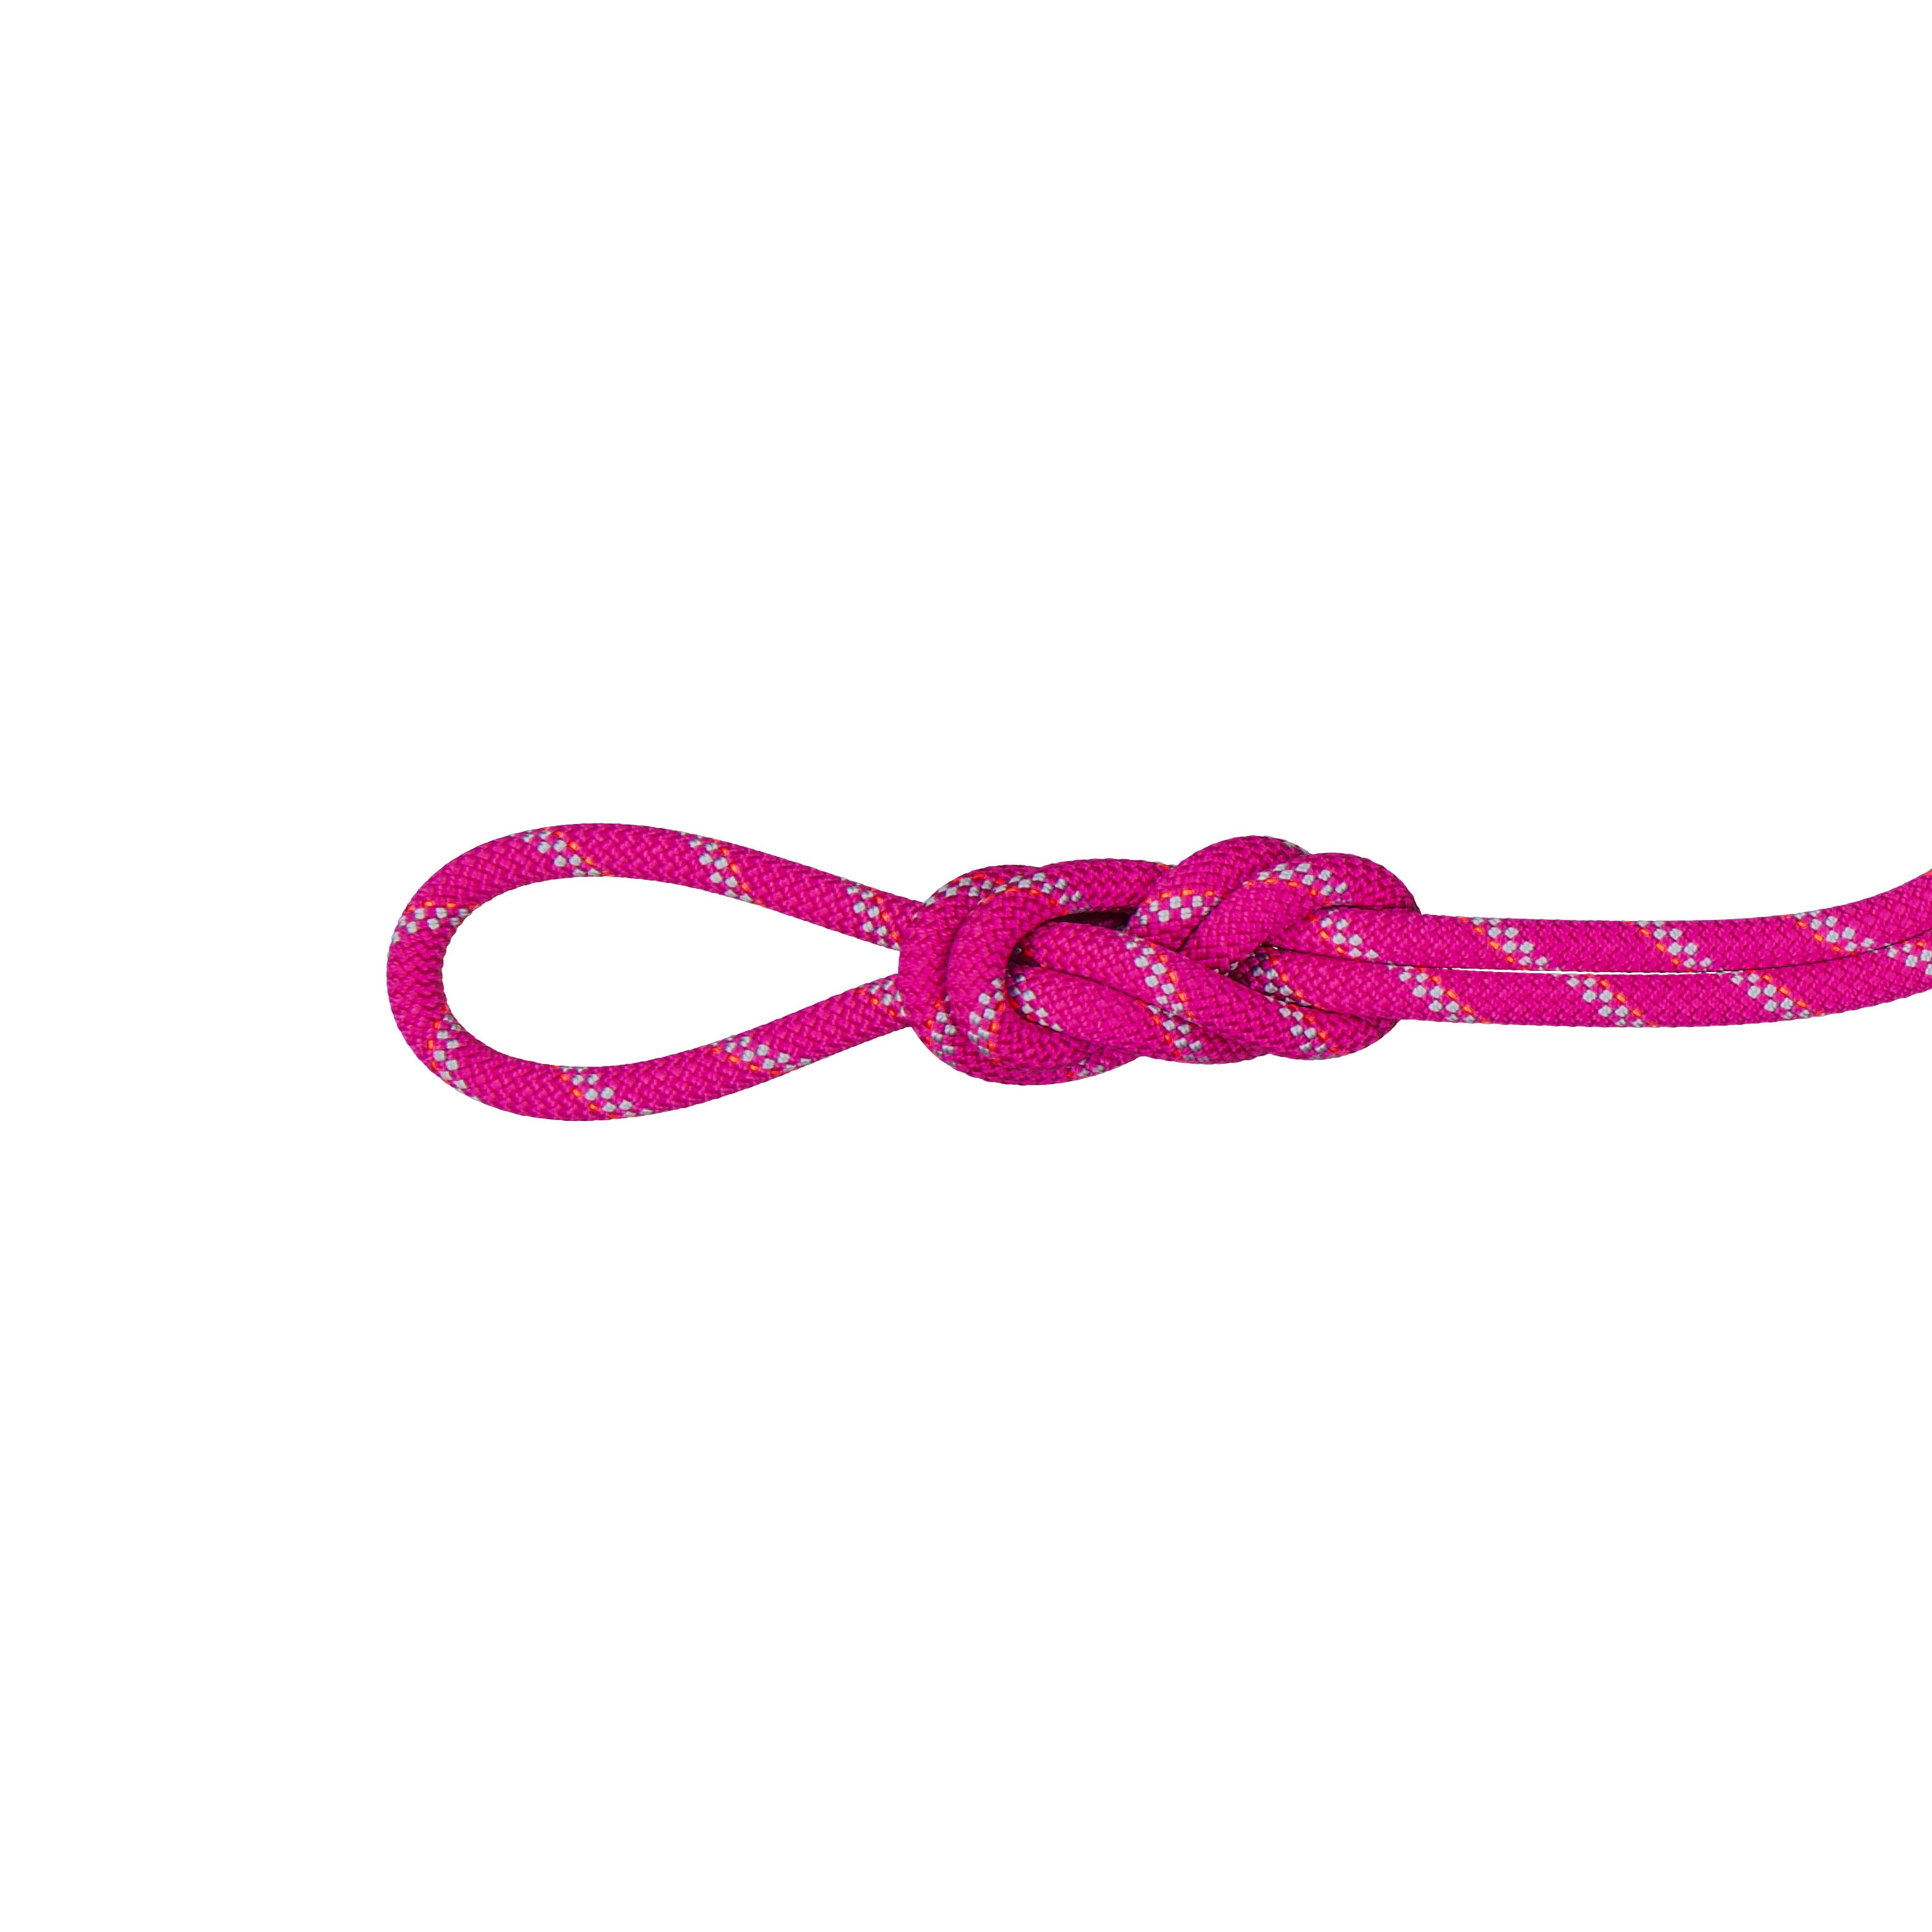 8.0 Alpine Dry Rope - 60 m, Dry Standard, pink-zen thumbnail